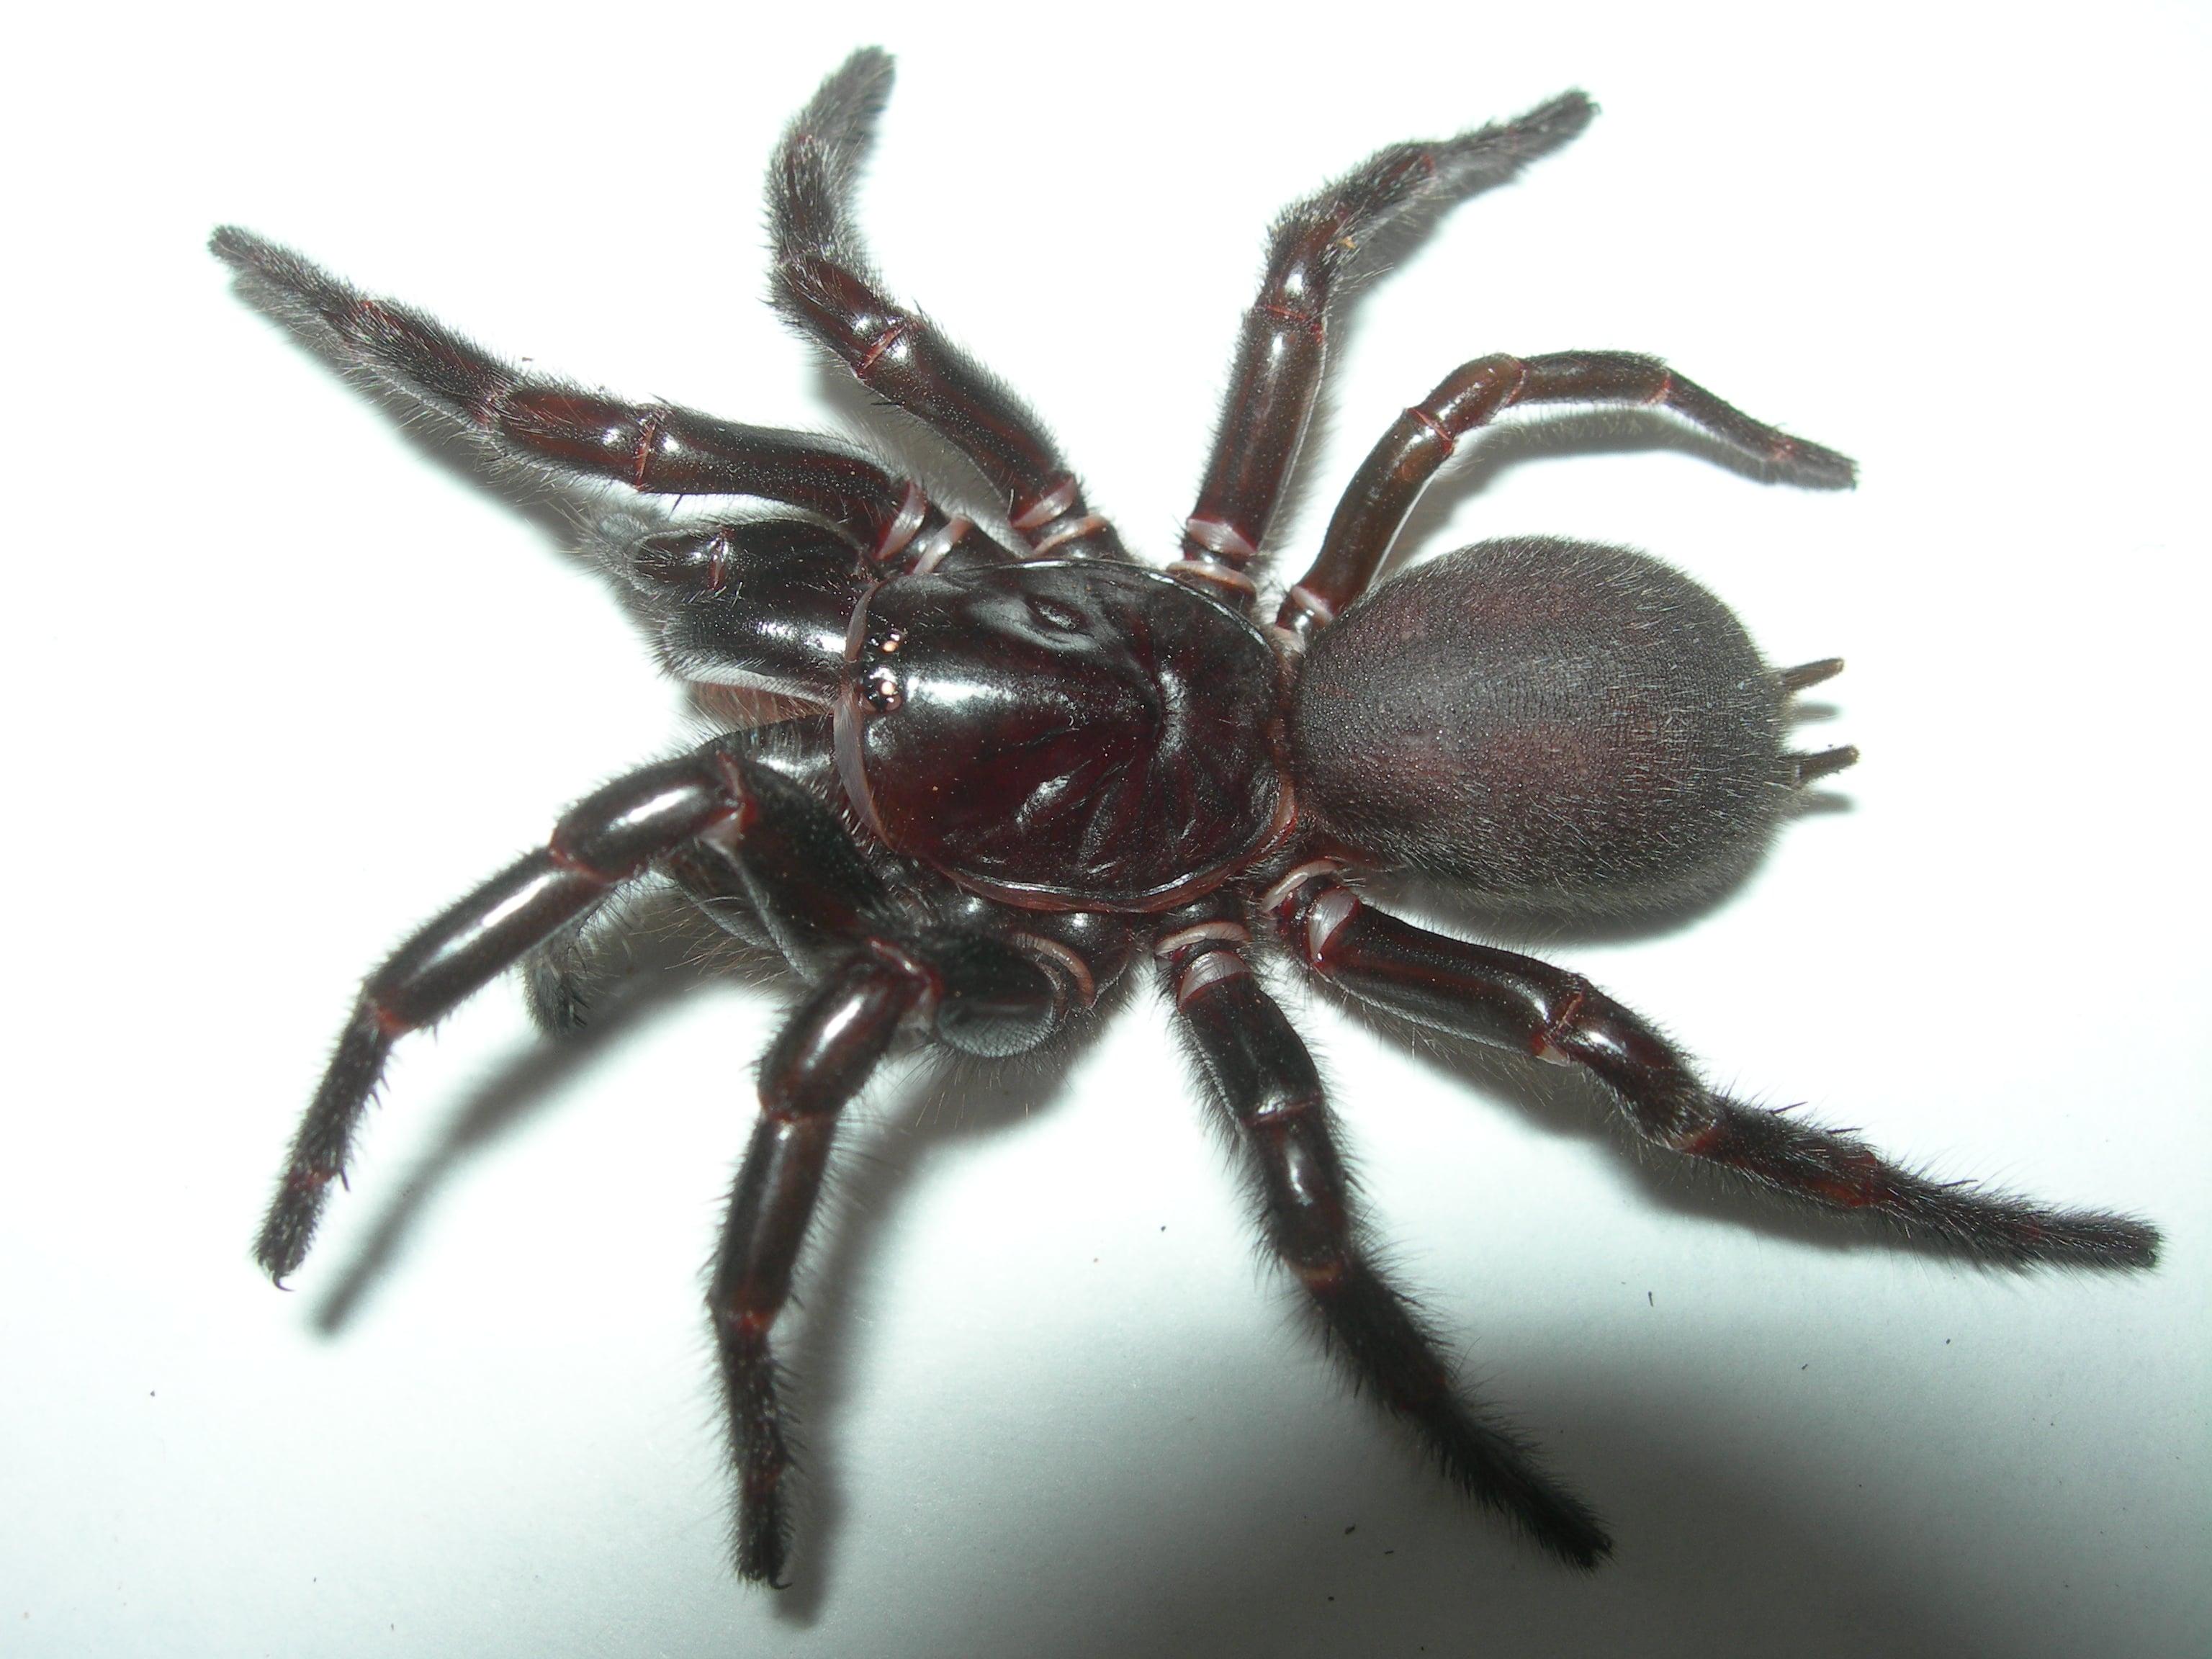 picaduras-de-arañas-13